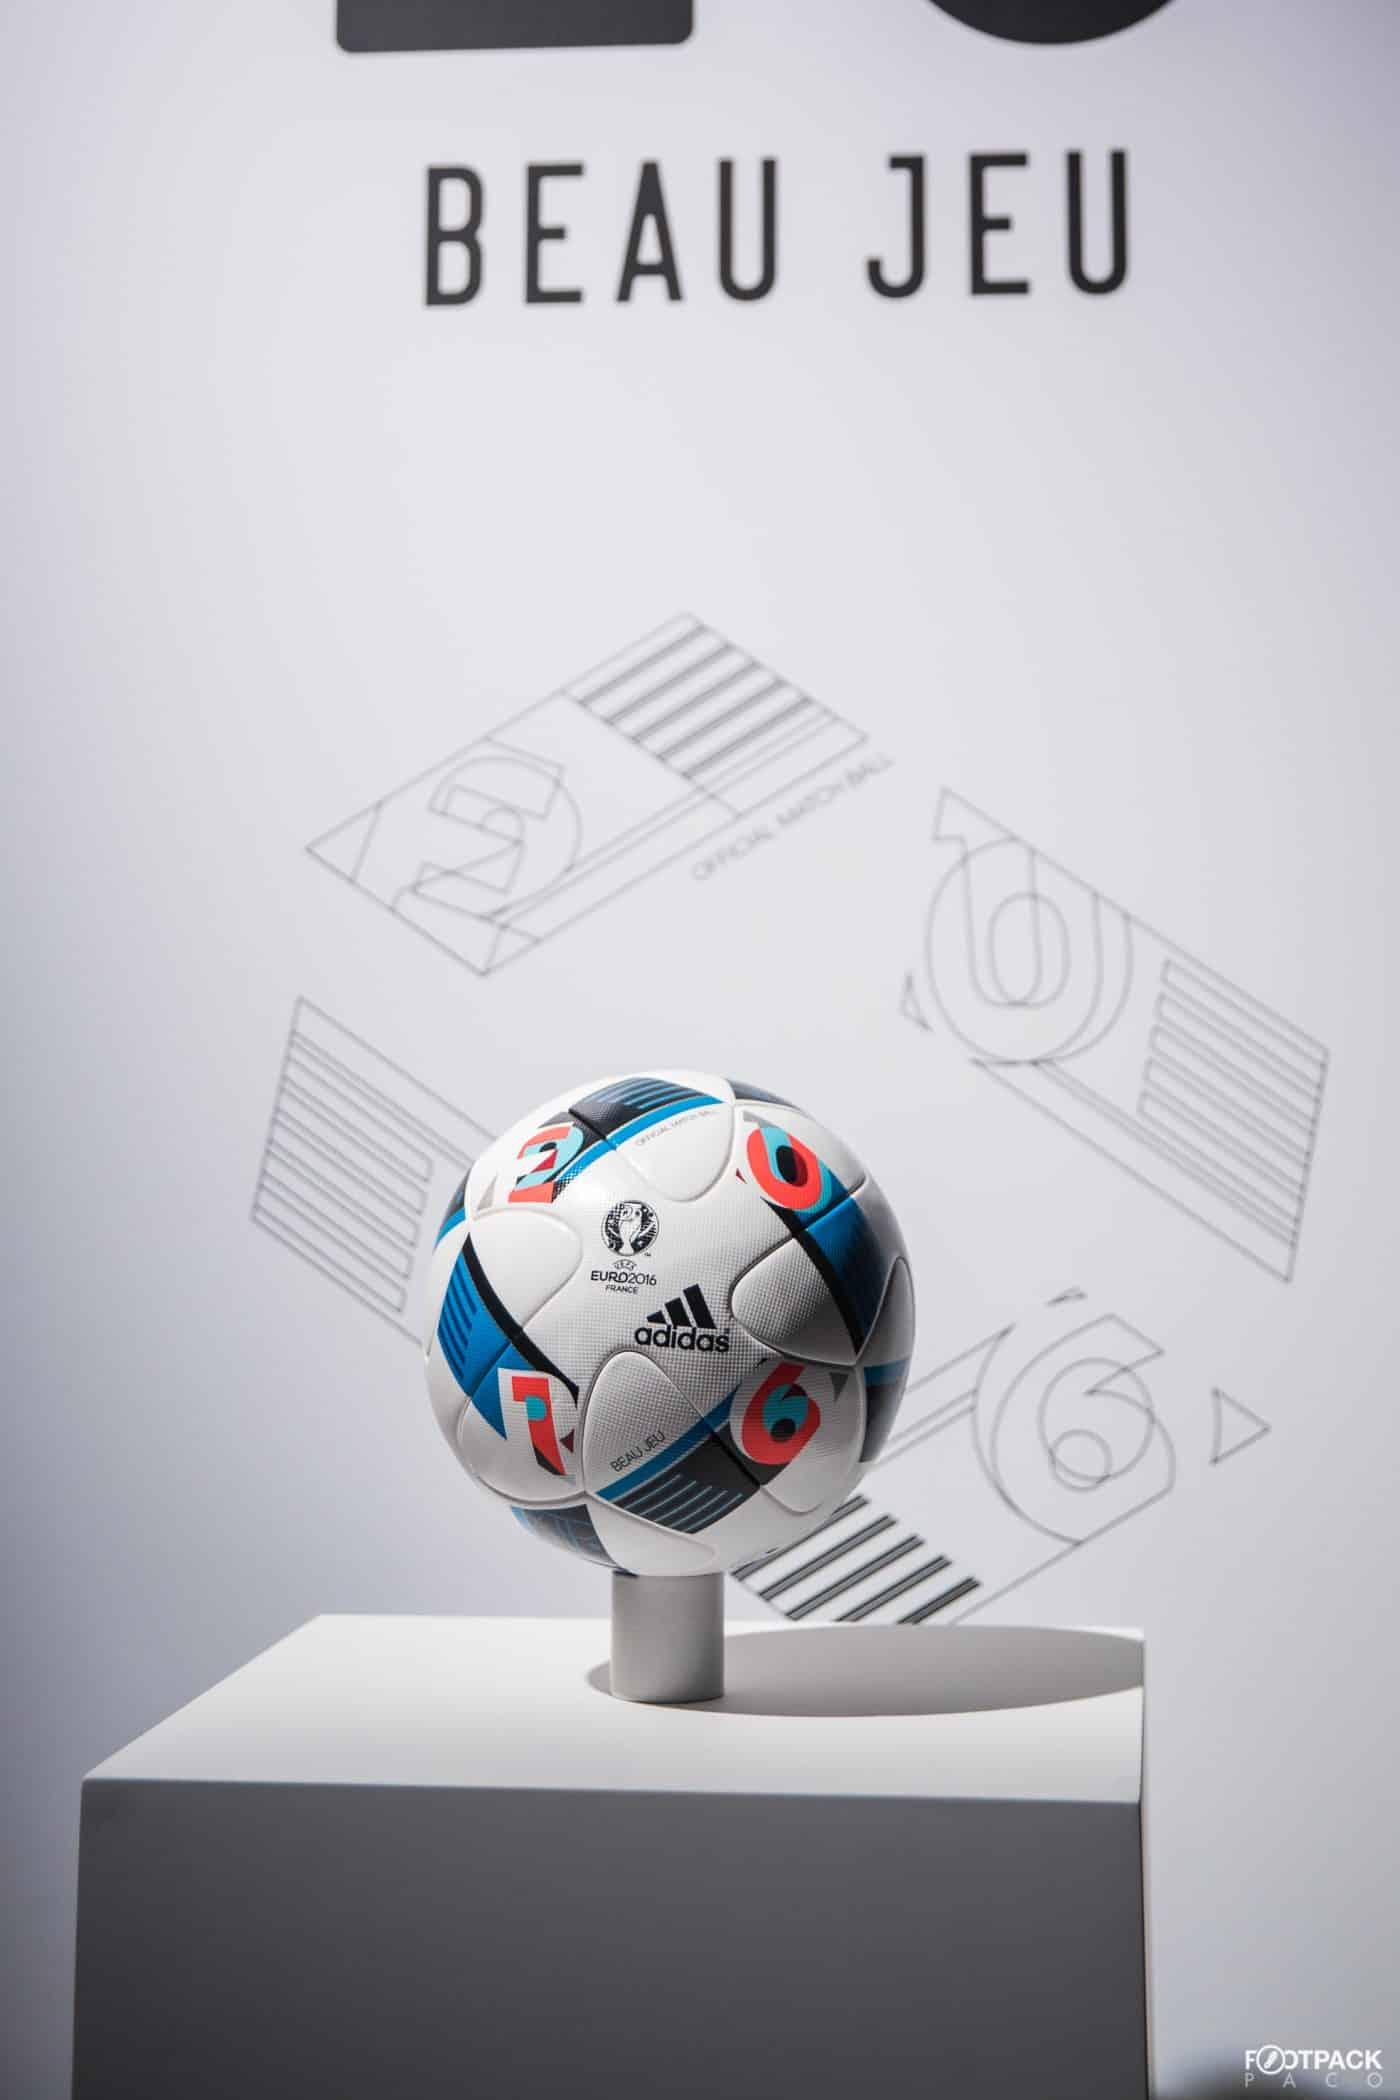 ballon-football-adidas-euro-2016-footpack-2019-2